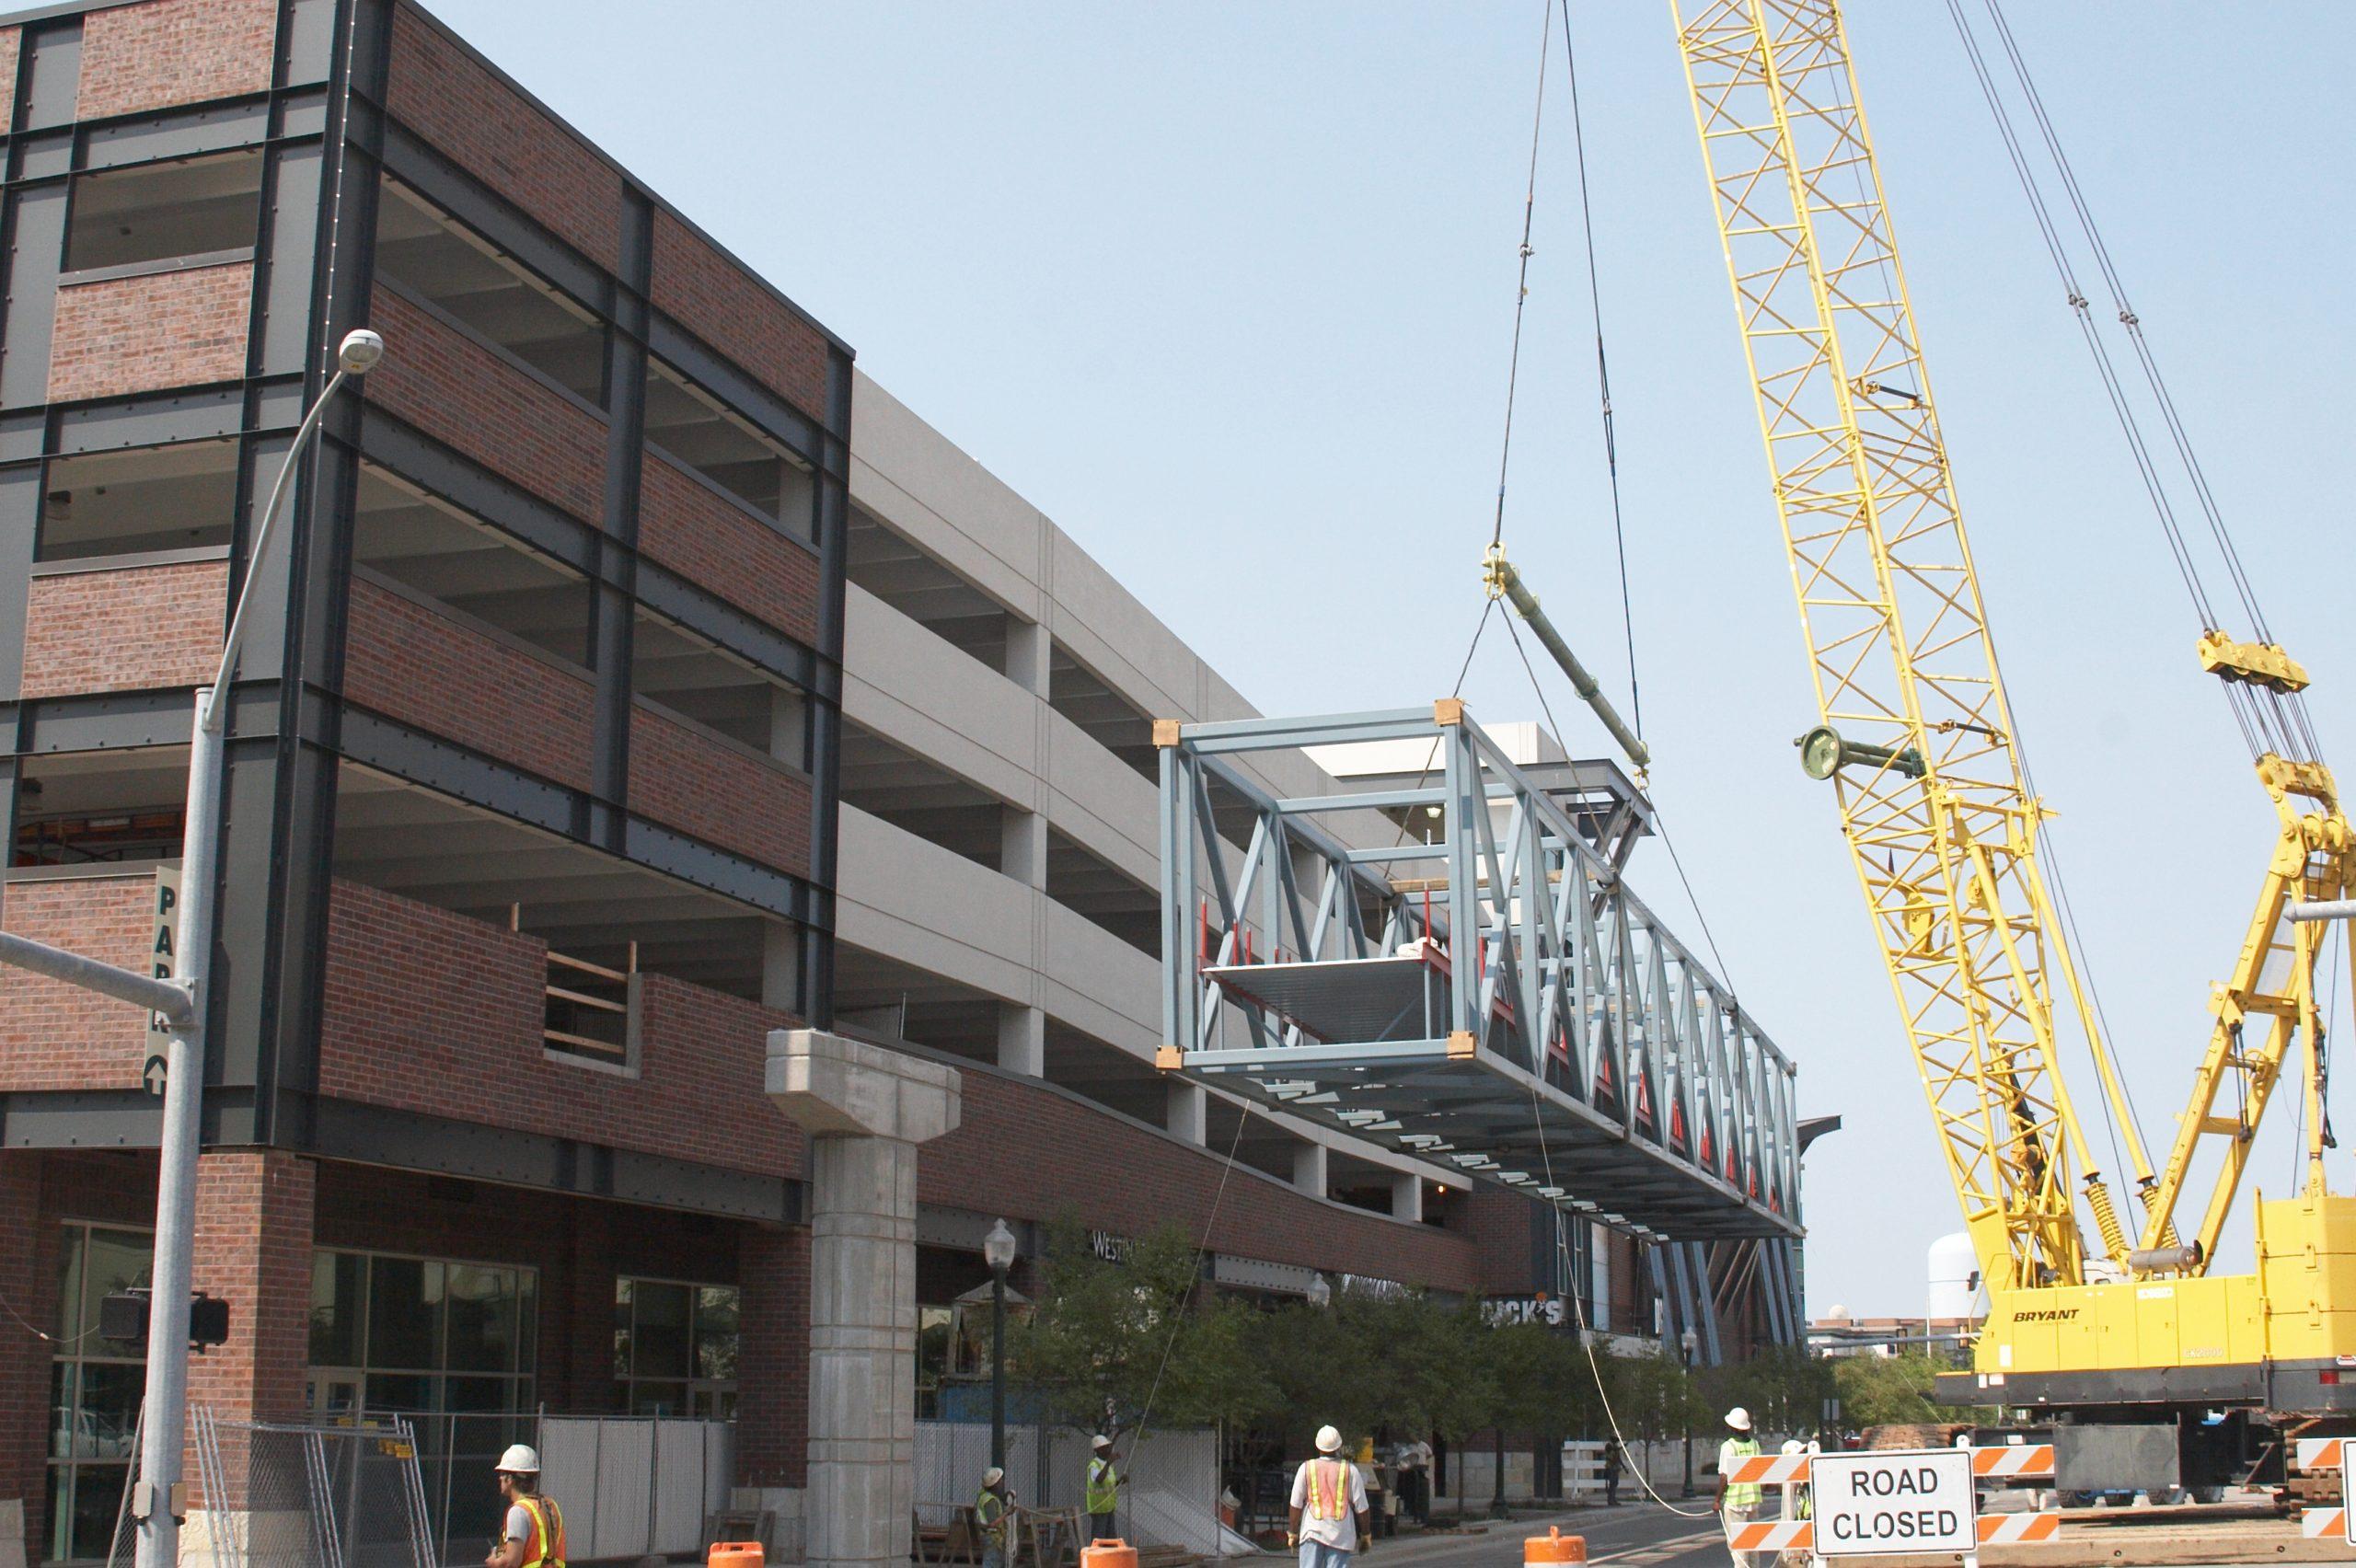 Lifting 130-ft long steel truss bridge